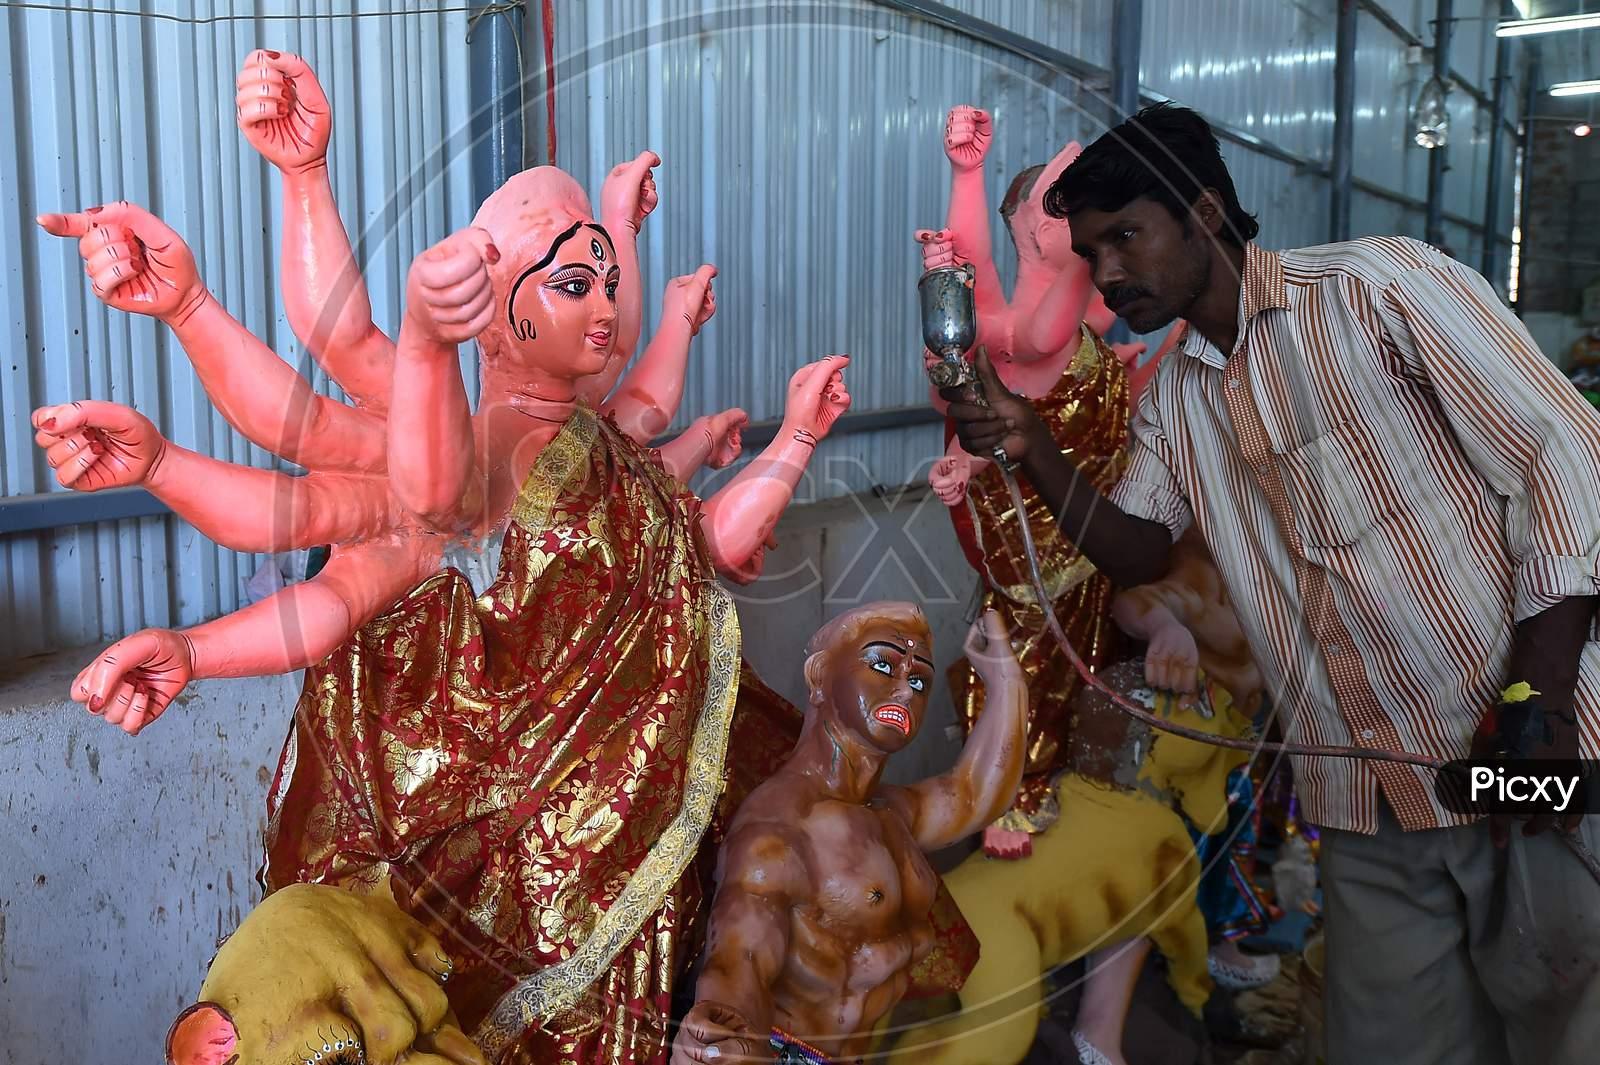 An Artisan Paints A Clay Sculpture Depicting The Goddess Durga Durga Ahead Of 'Durga Puja' Festival, In Chennai On October 15, 2020.